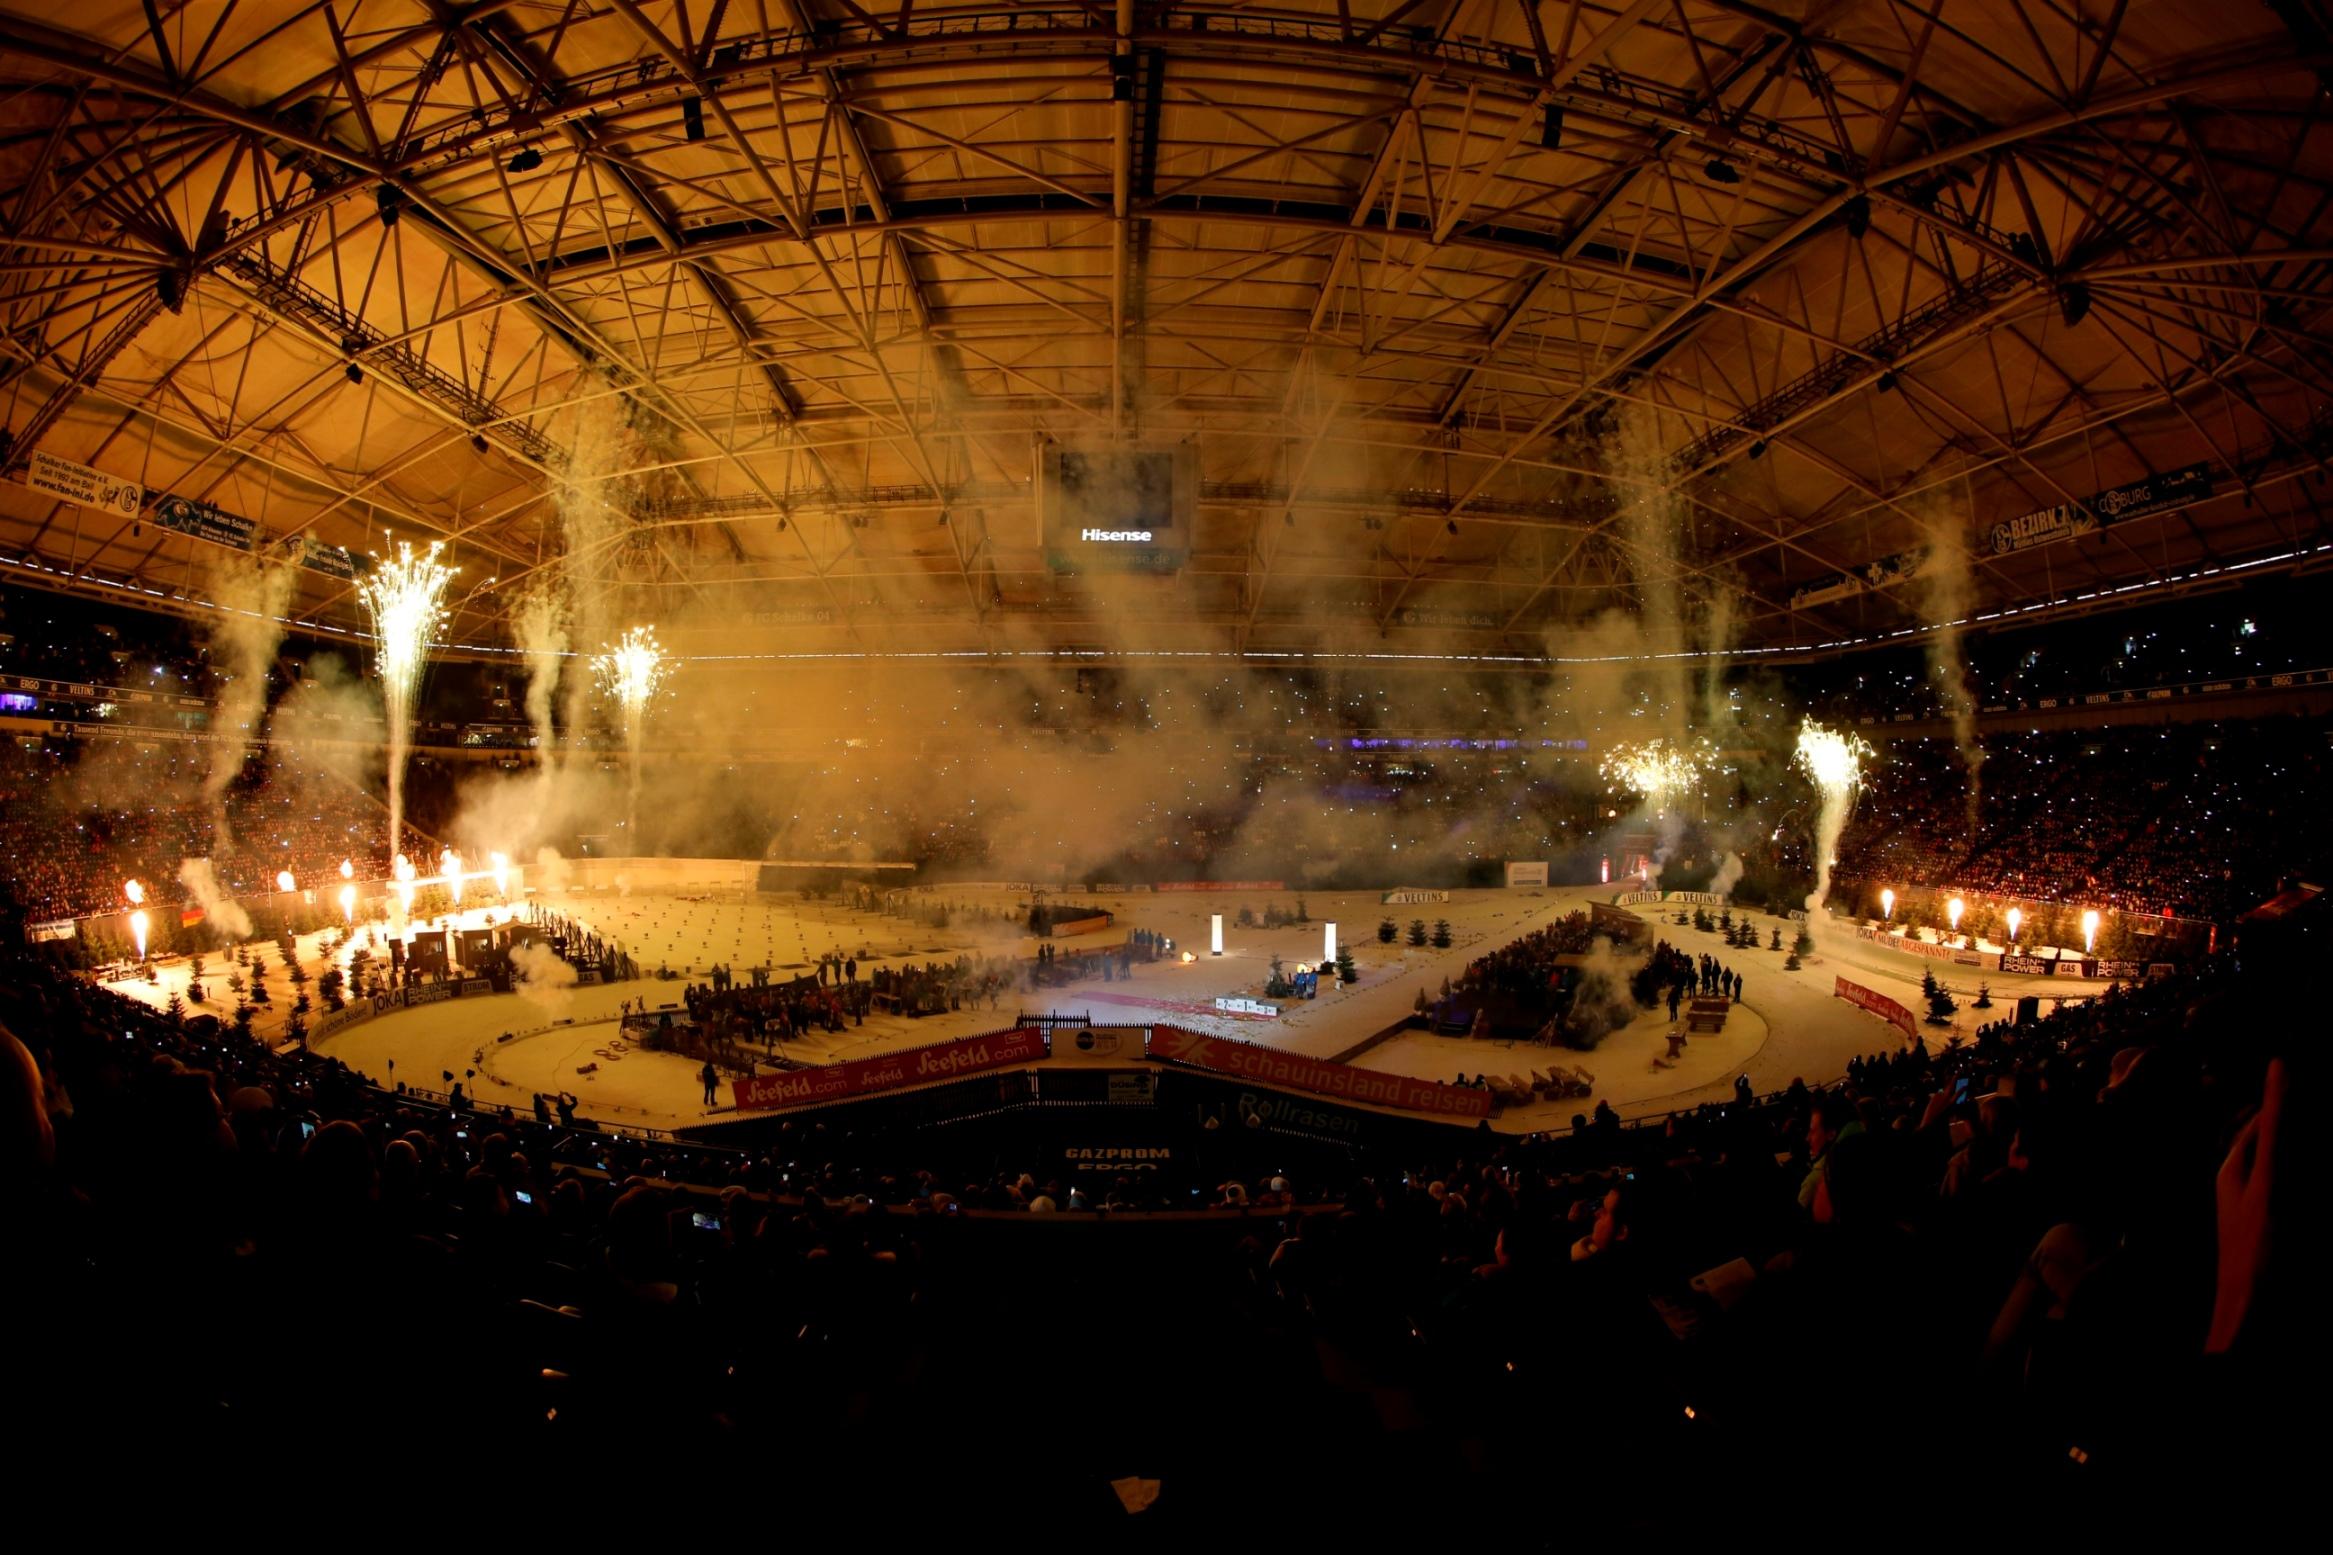 https://fasterskier.com/wp-content/blogs.dir/1/files/2014/12/WTC-Biathlon_Feuerwerk_2014.jpg